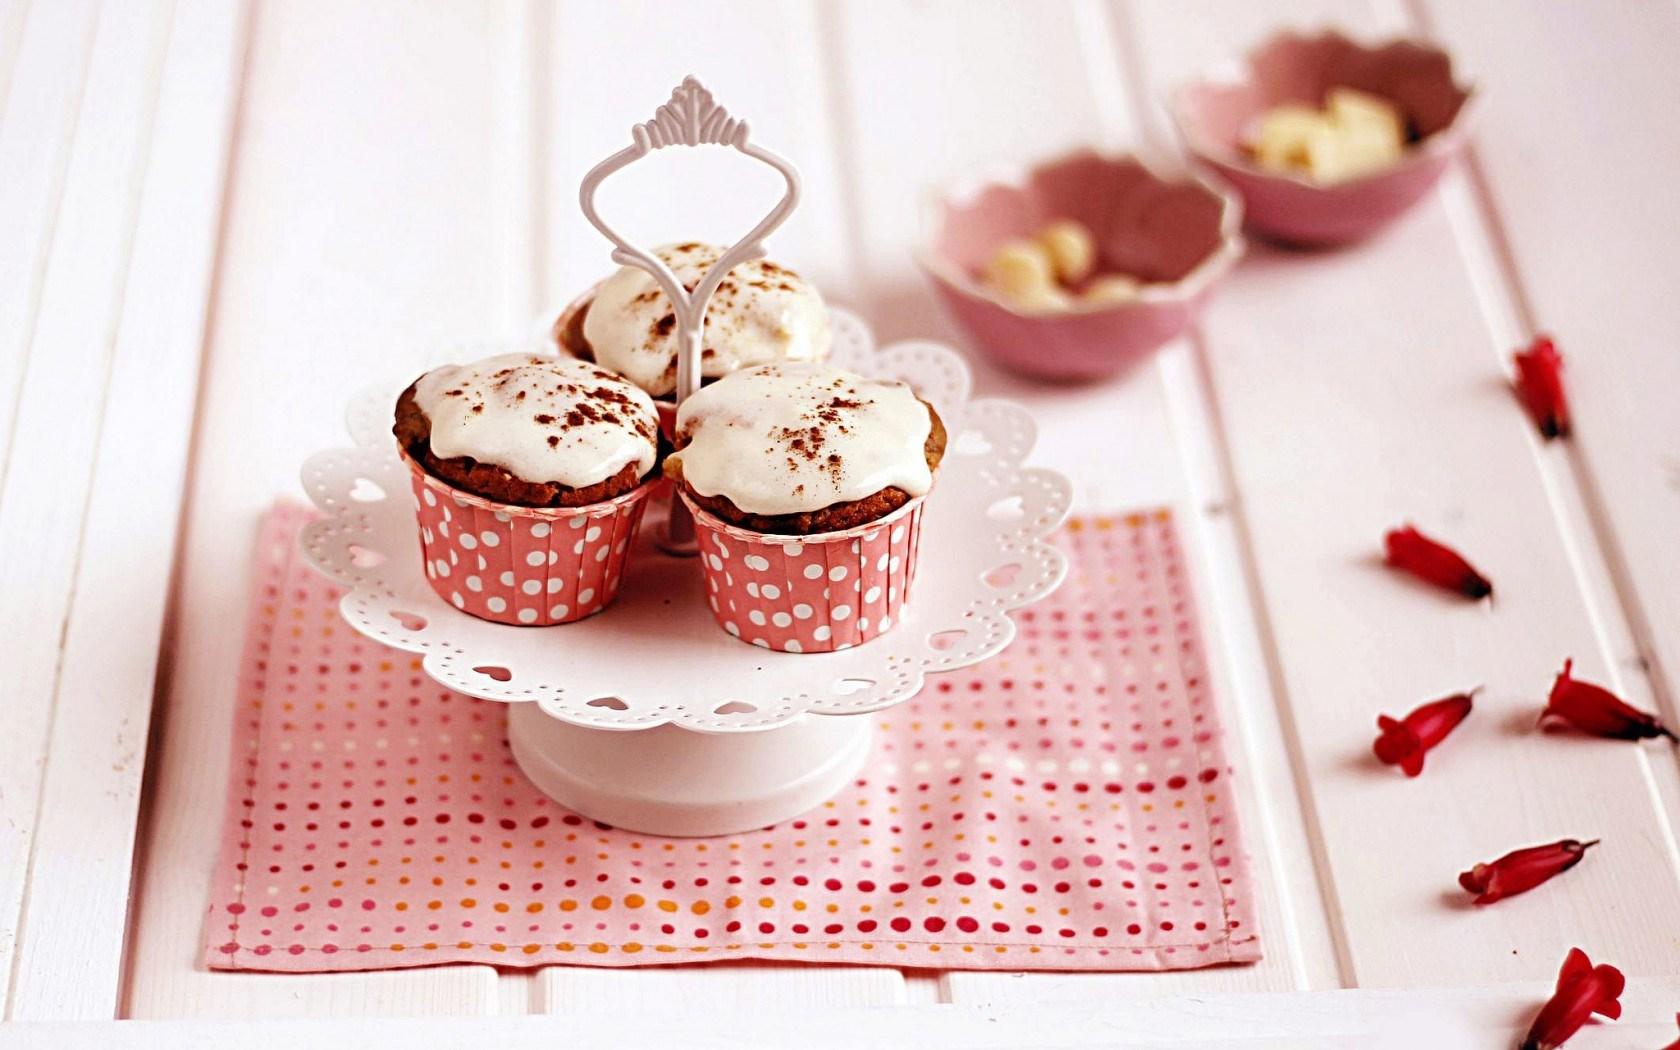 Cute-Birthday-Cupcake-wallpaper-wp3604450